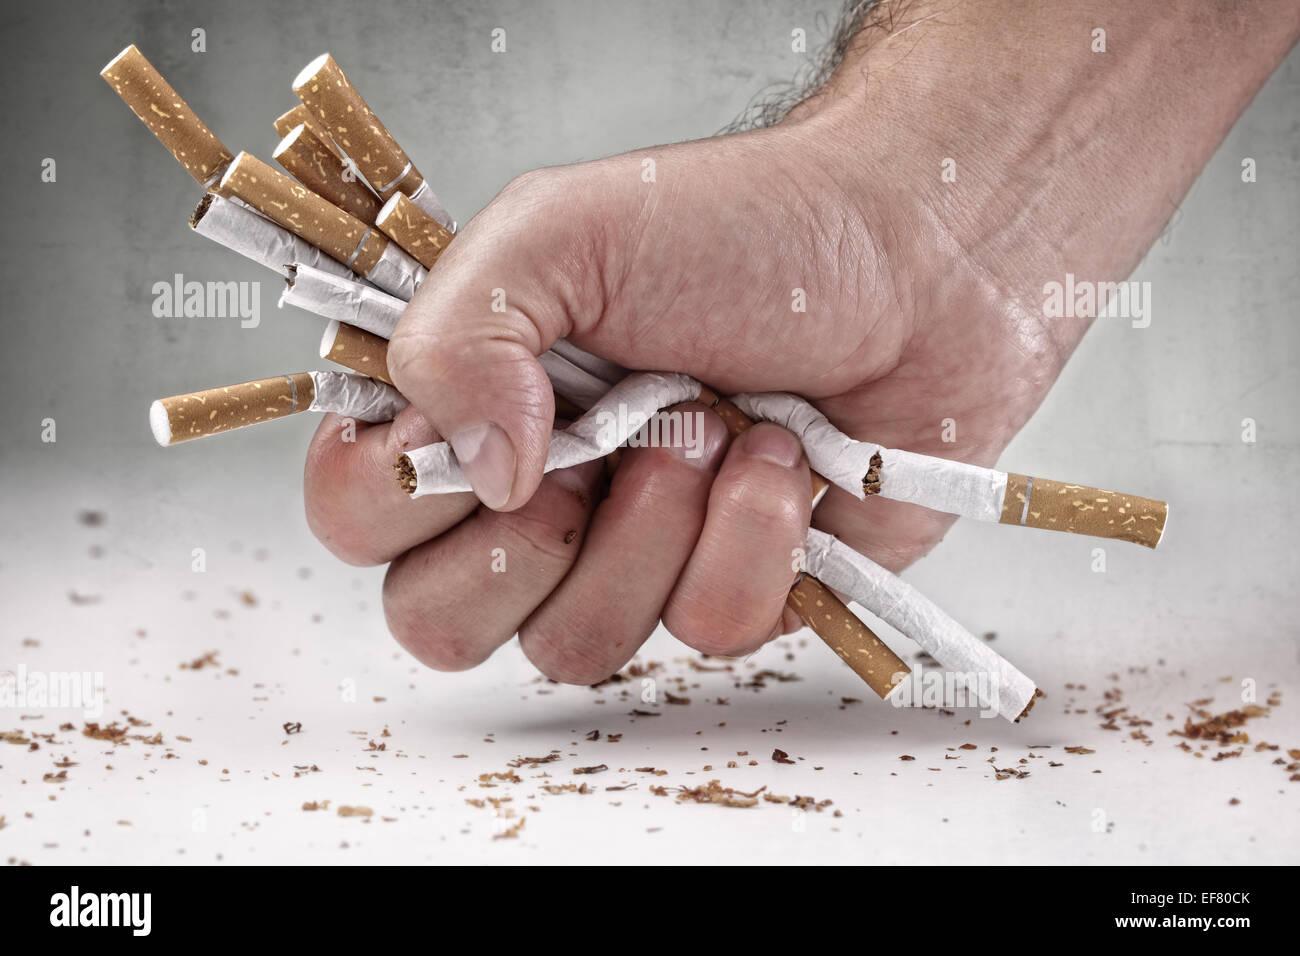 Quit smoking - Stock Image